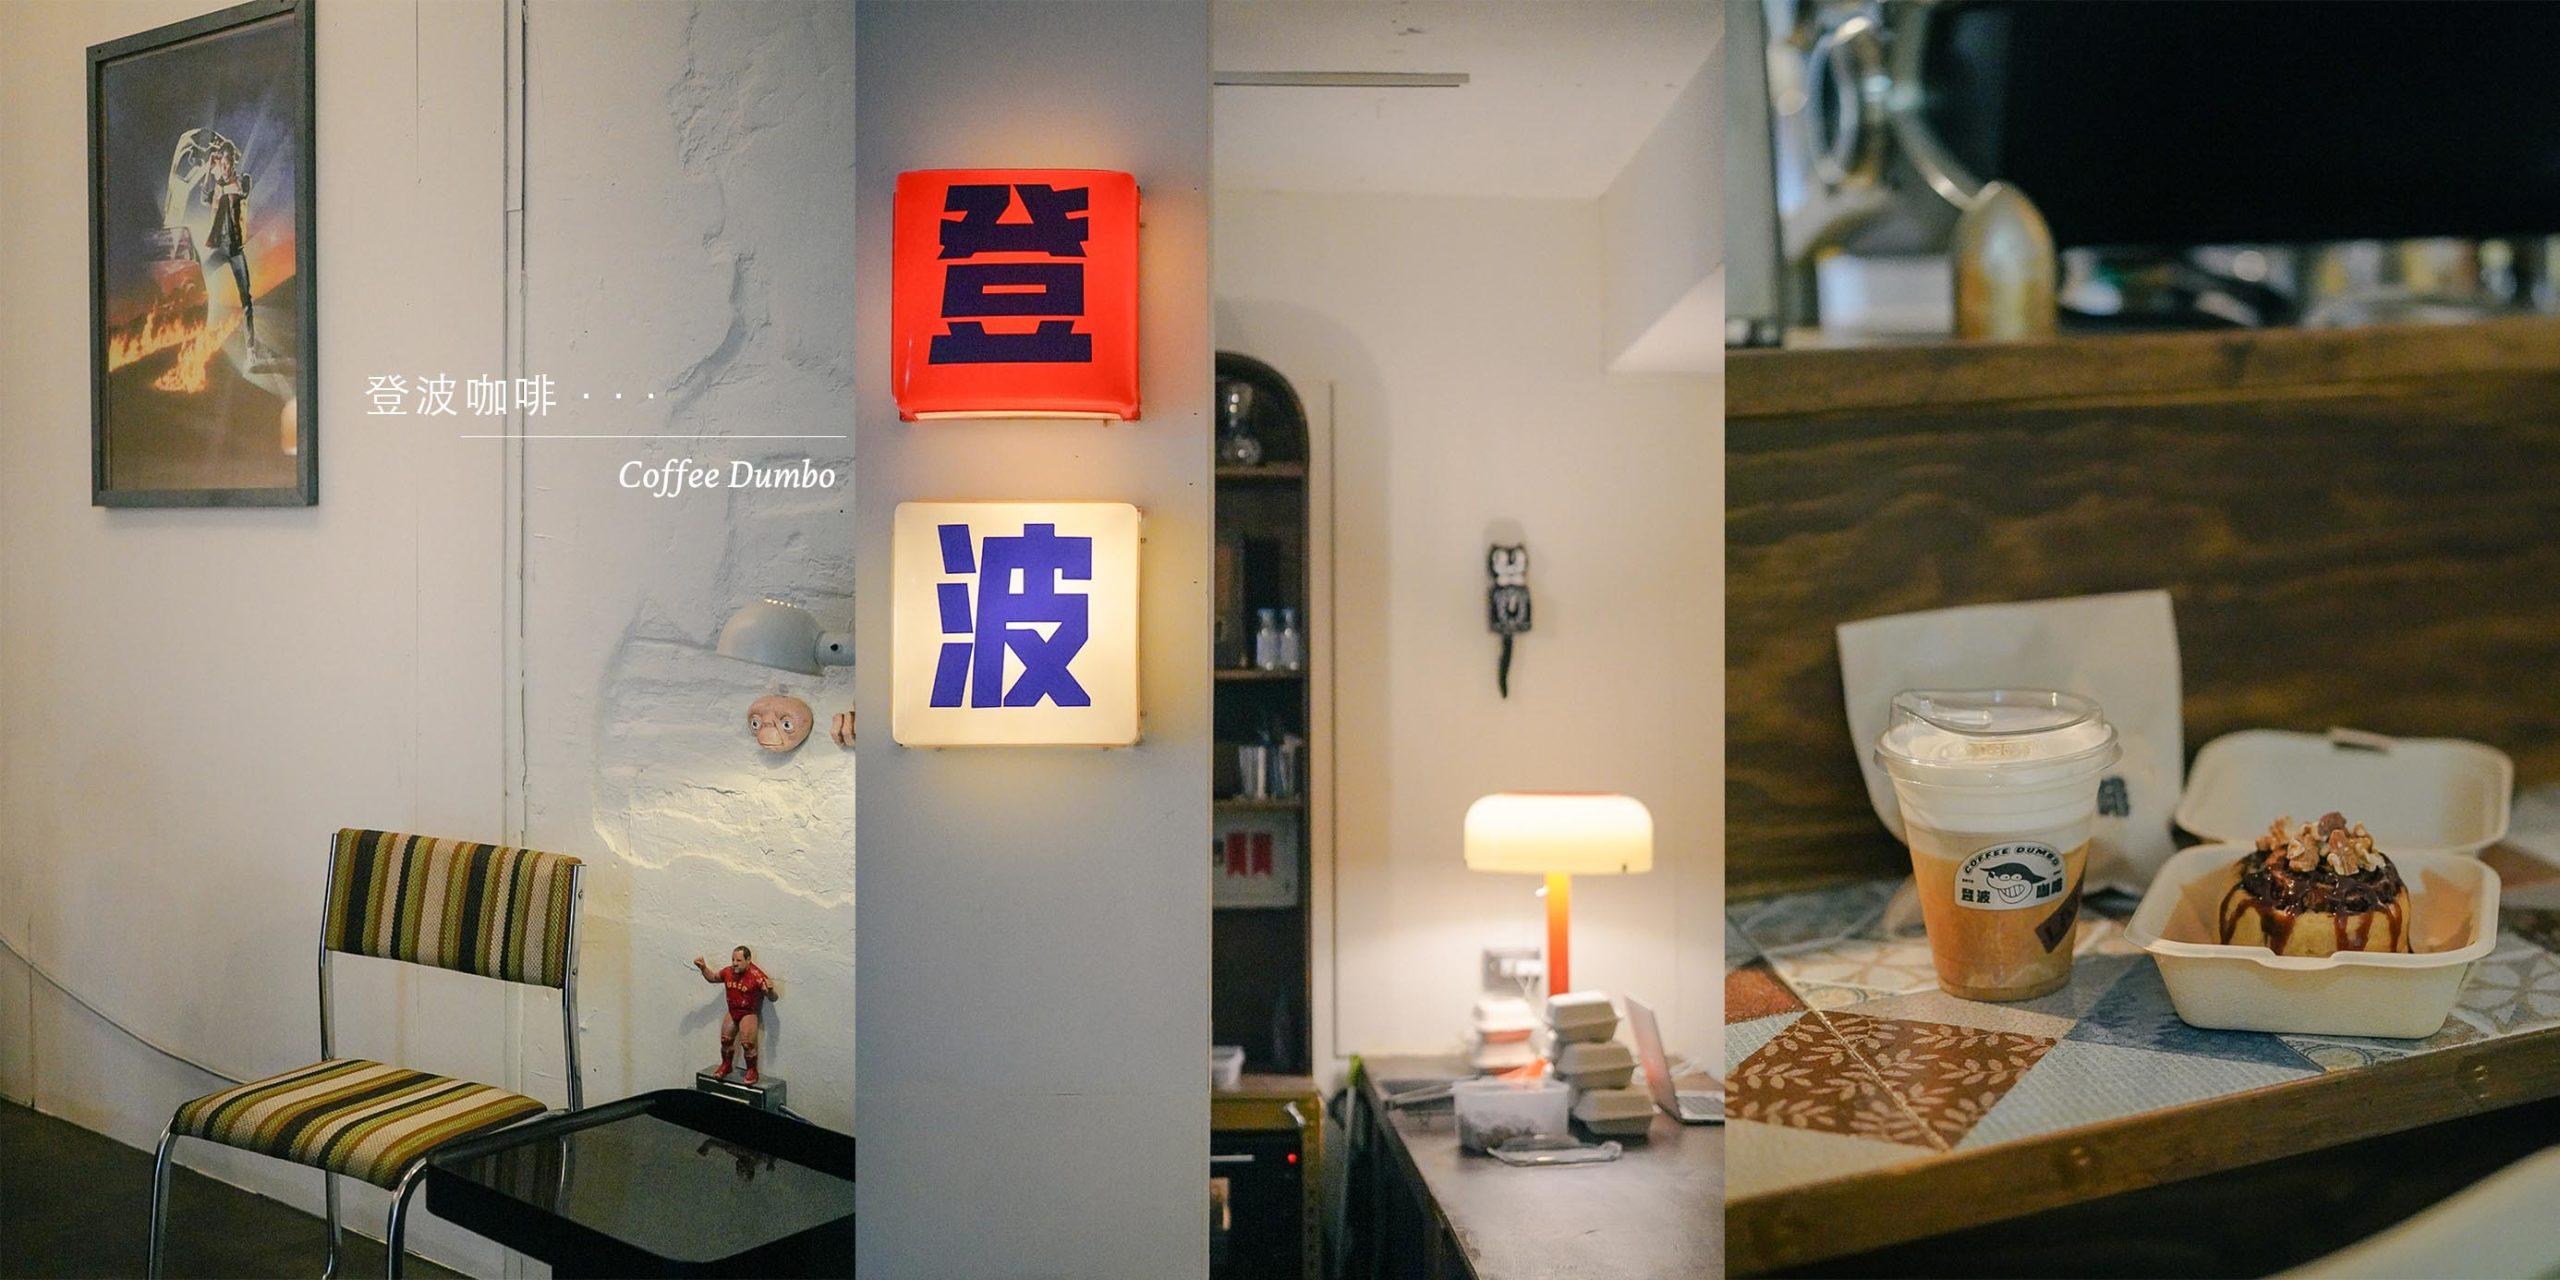 Read more about the article 中山站登波咖啡|探訪赤峰街上的美式復古咖啡廳,取得微辣與甜蜜平衡的肉桂捲